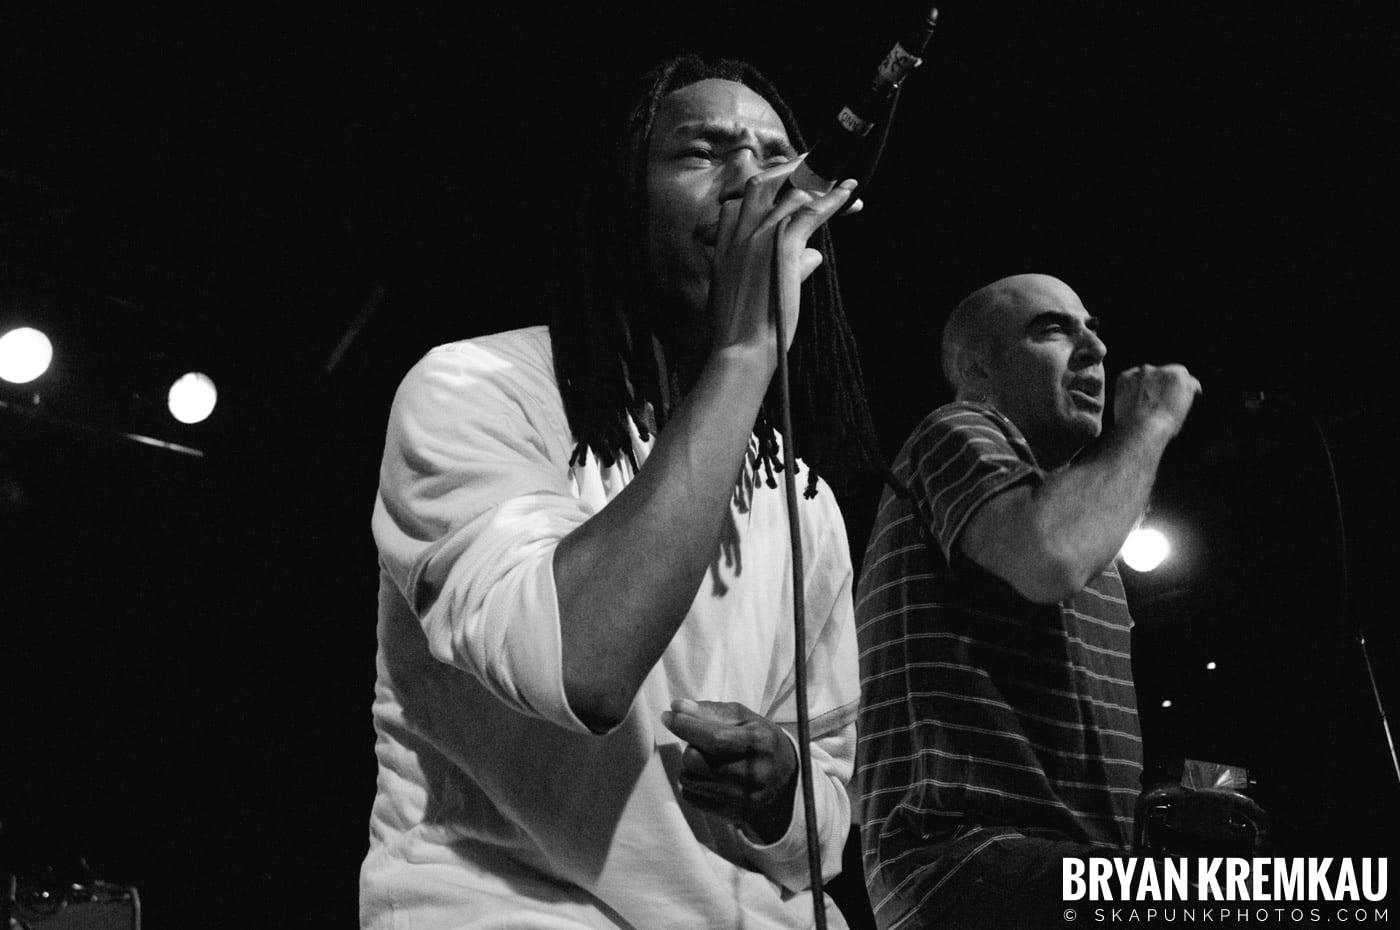 Pilfers (Ska is Dead Tour) @ Starland Ballroom, Sayreville, NJ - 11.15.09 (10)